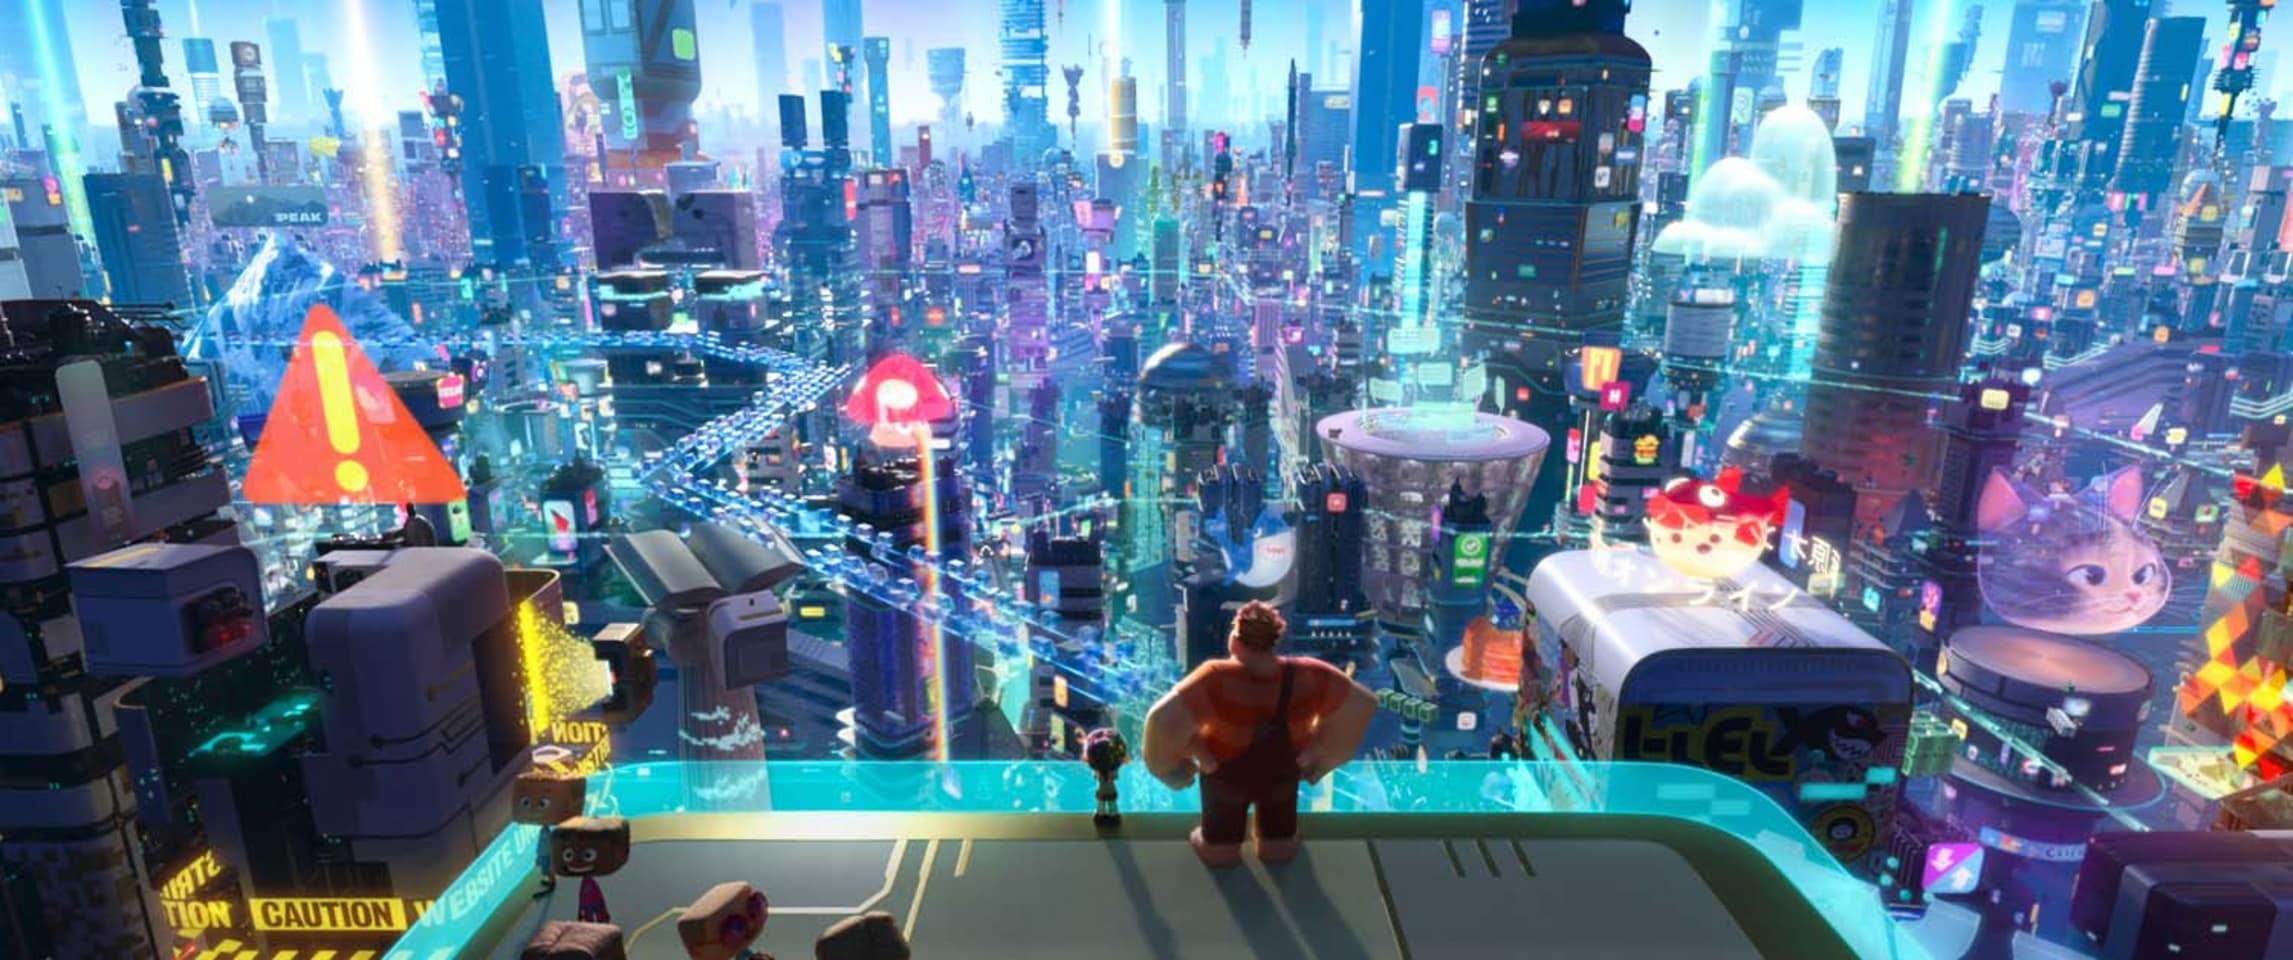 Internet City in 'Ralph Breaks the Internet'